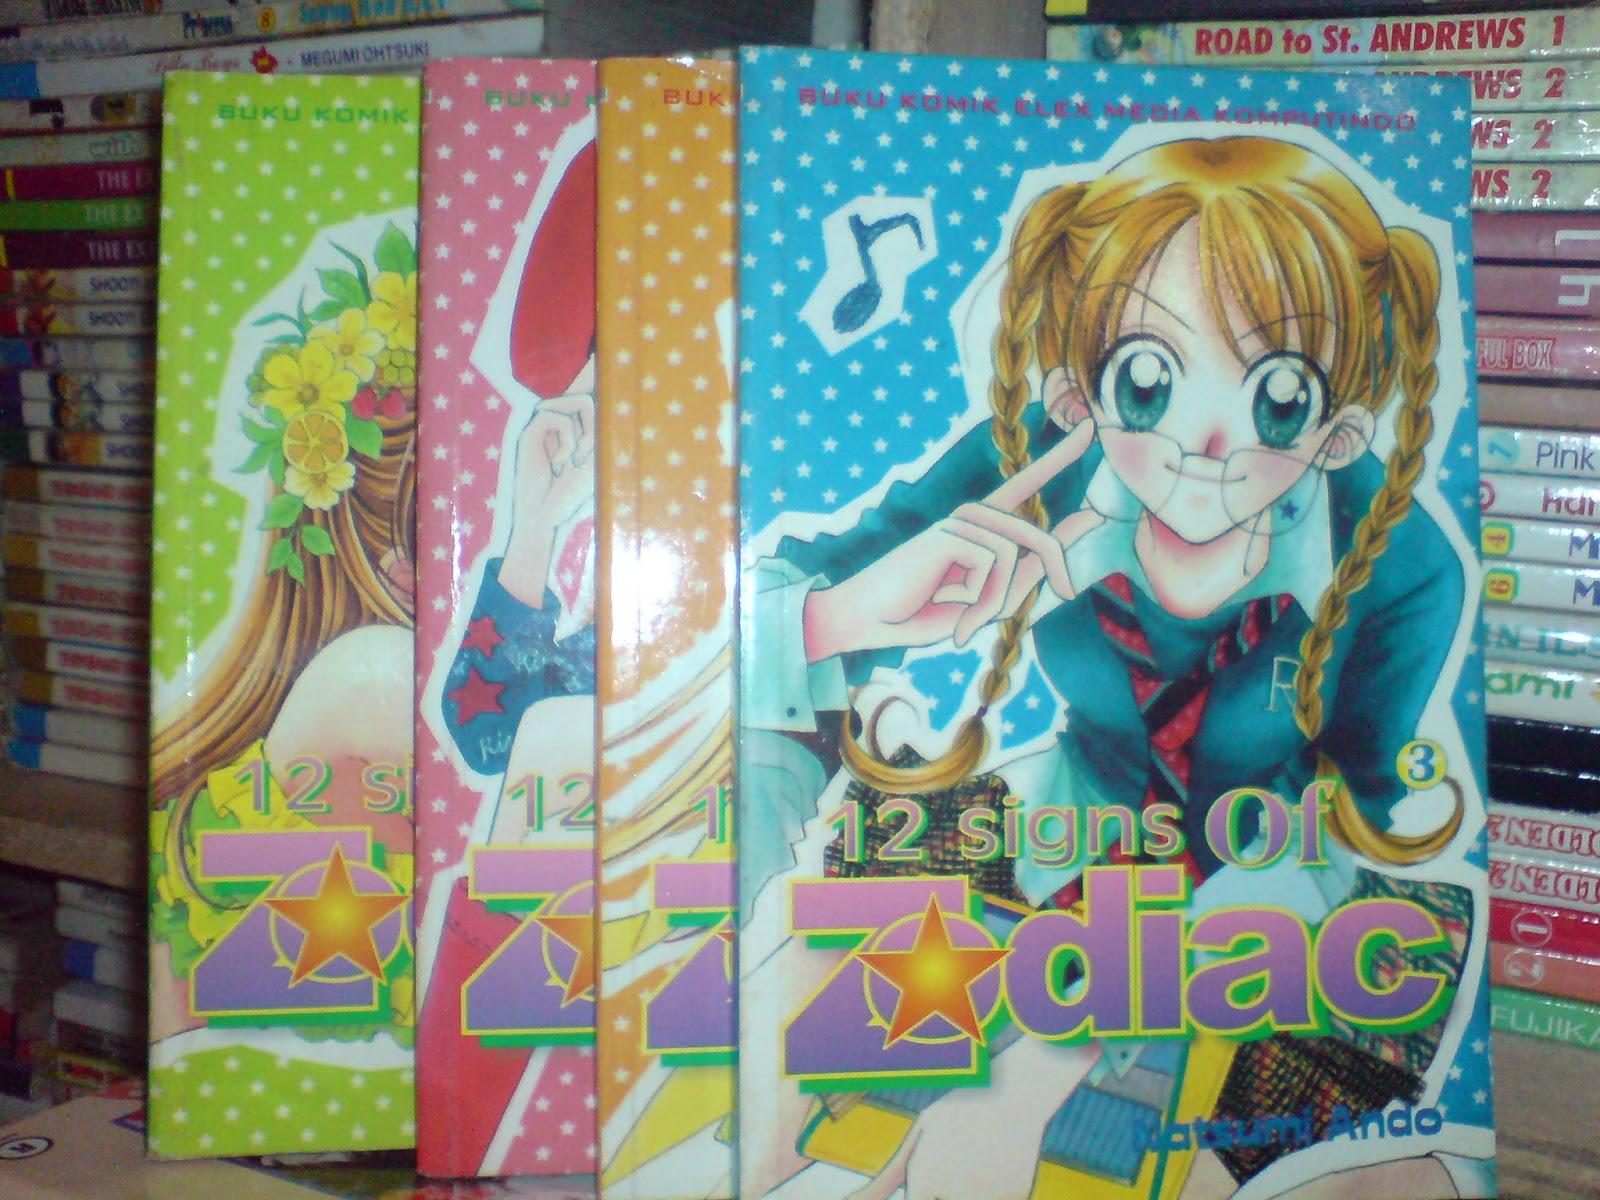 Komik Jepang Bekas Murah 12Signs Of Zodiac 1 4 Tamat